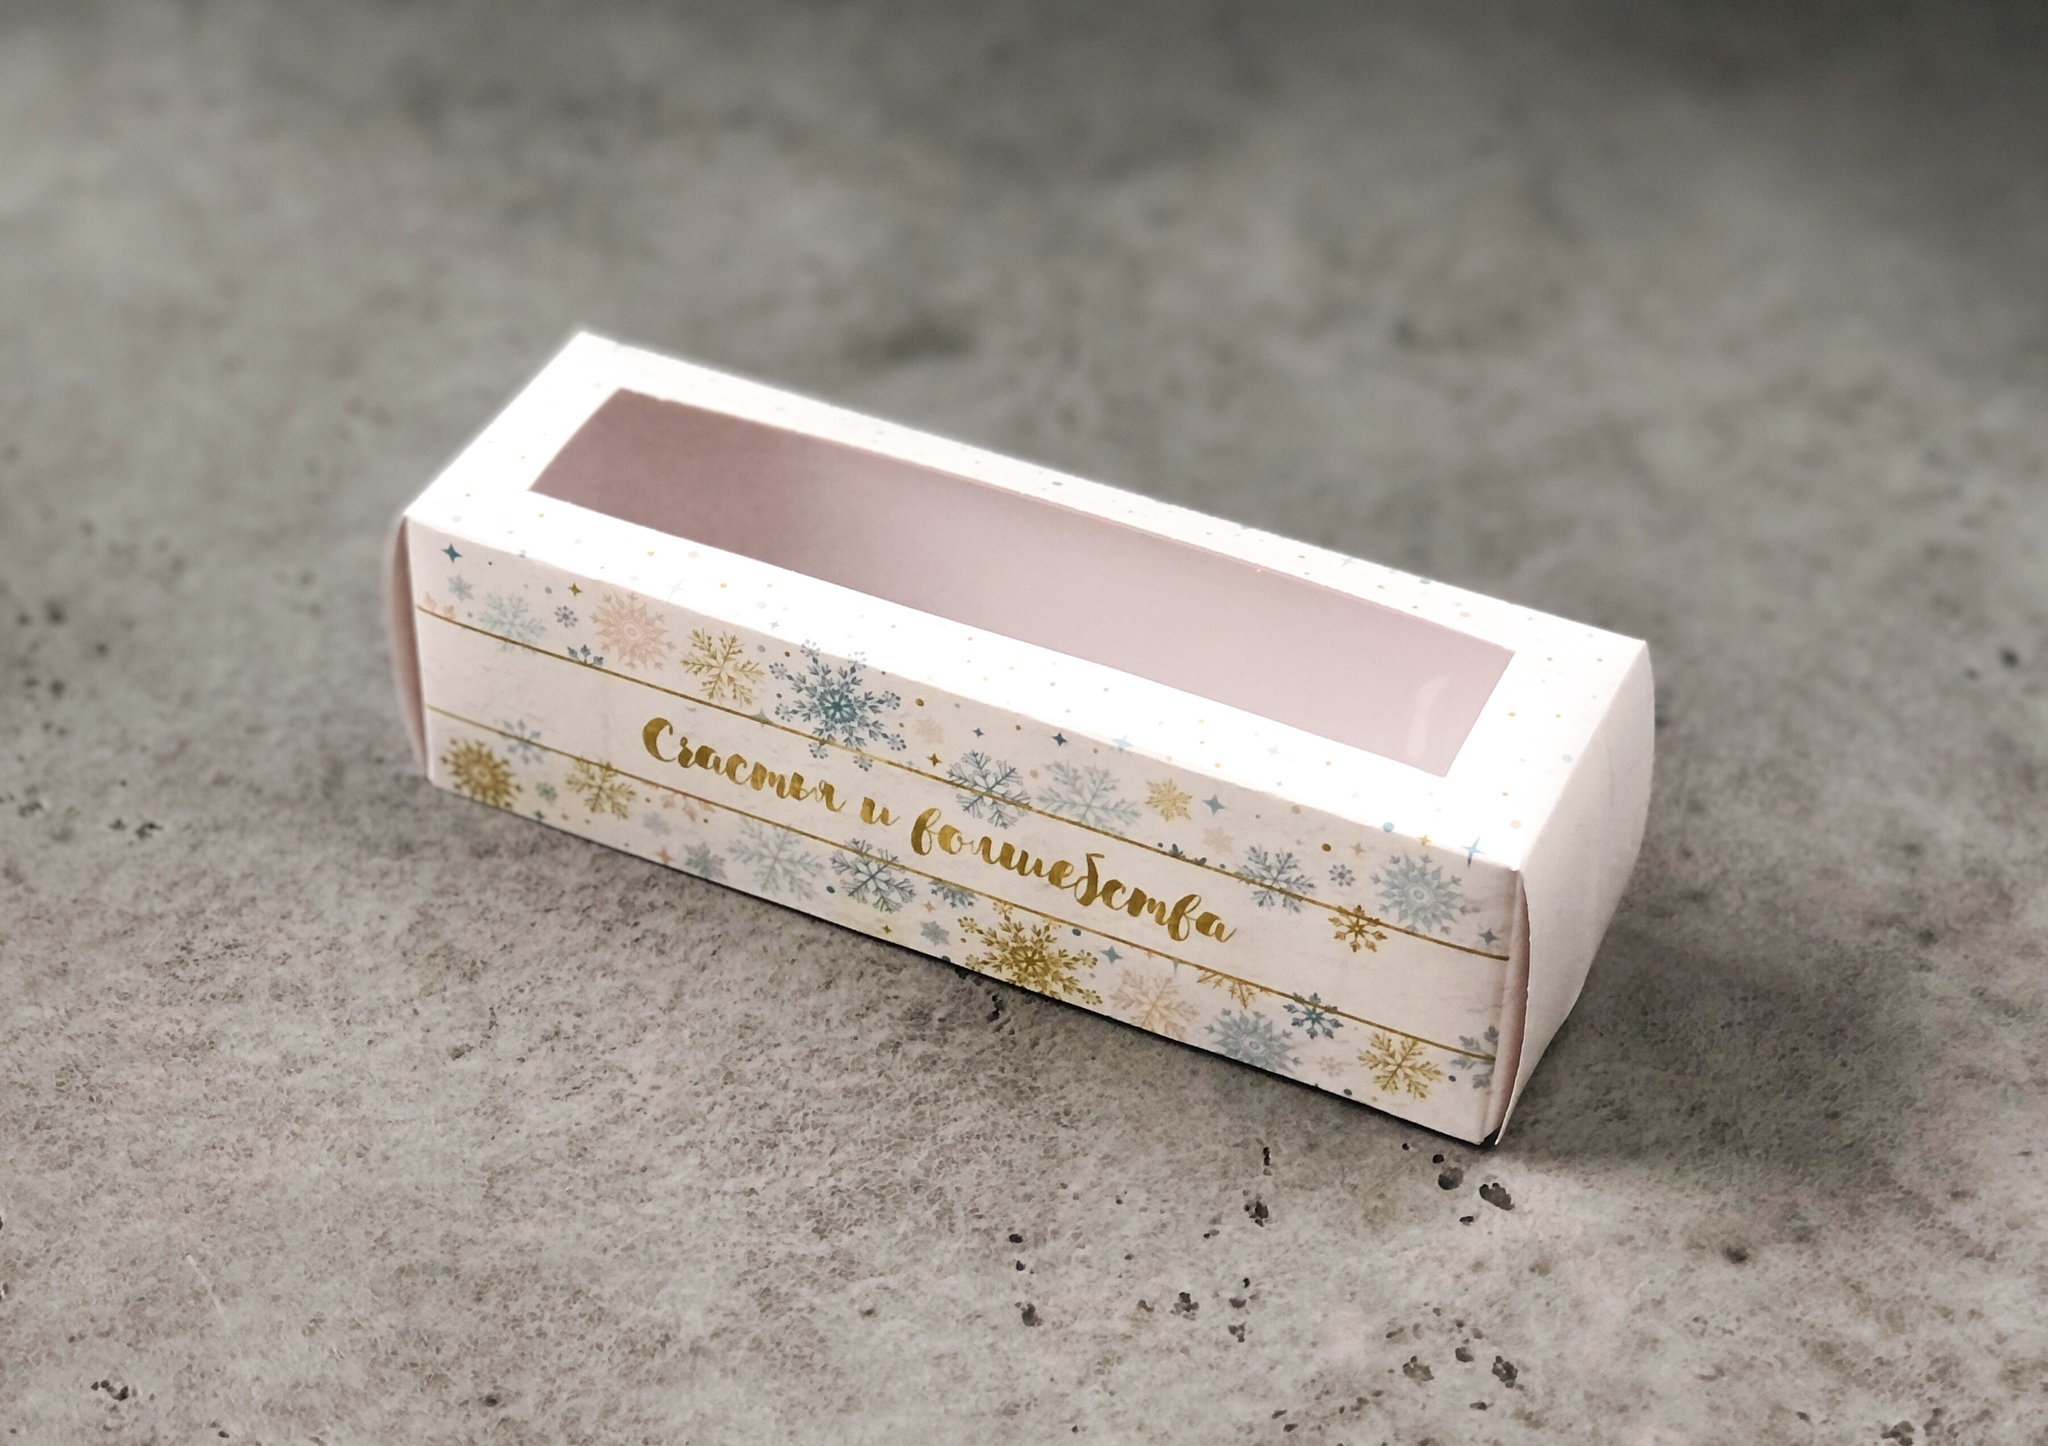 Коробка новогодняя для макаронс «Счастья и волшебства», 18х5,5х5,5 см